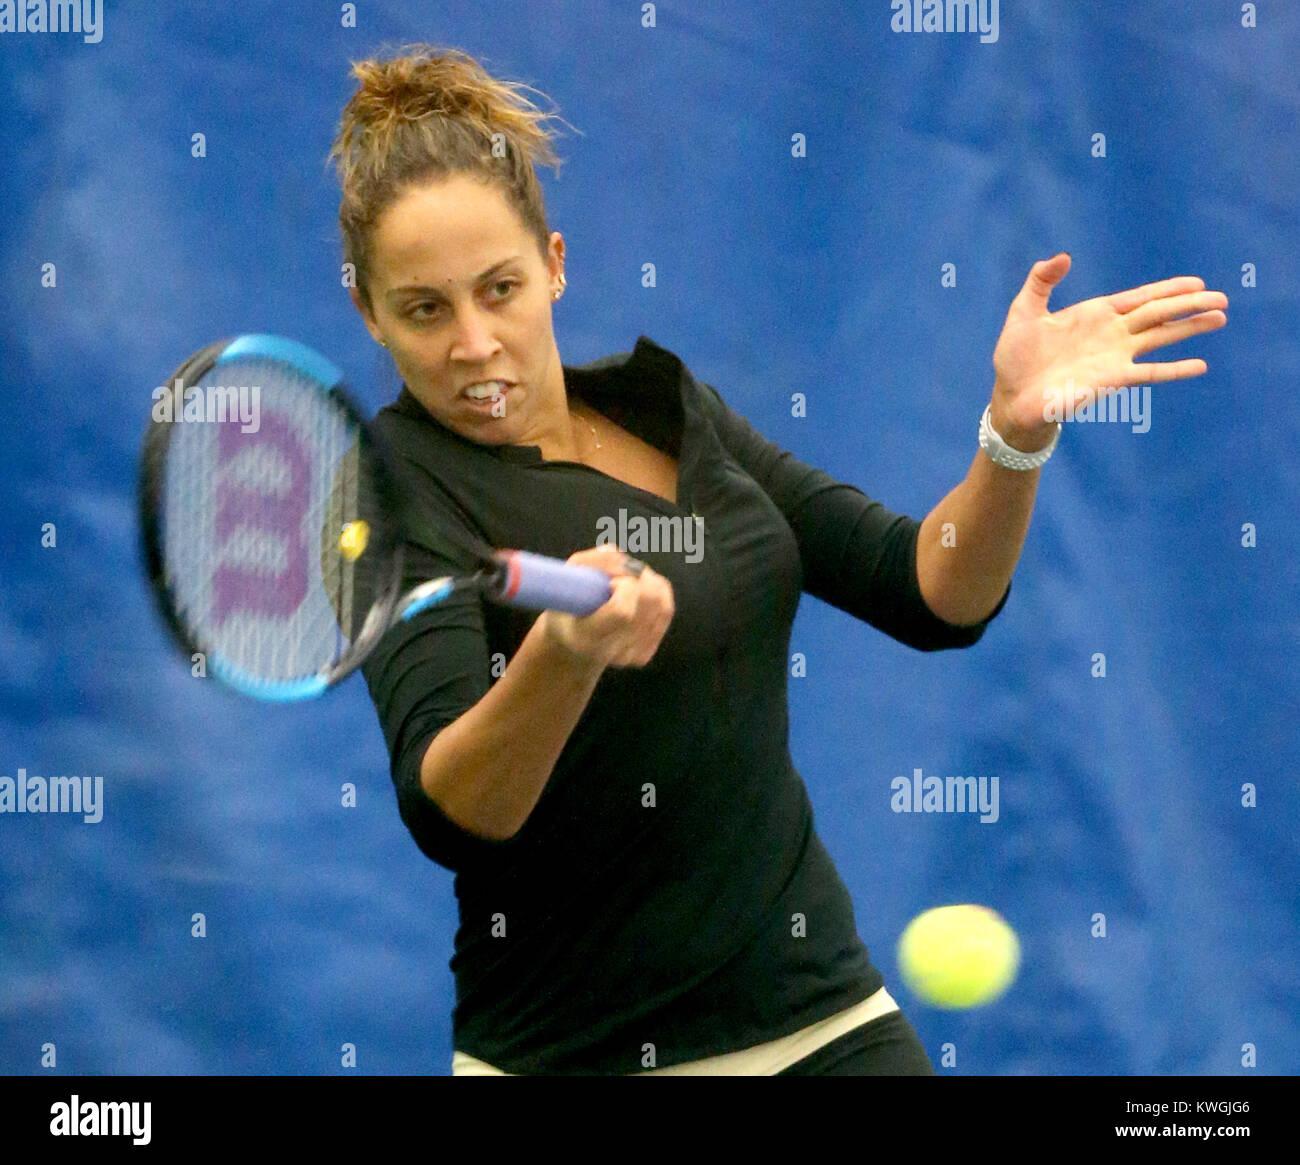 Moline, Iowa, USA. 16th Nov, 2017. Rock Island native Madison Keys, the 19th ranked tennis player in the world, - Stock Image